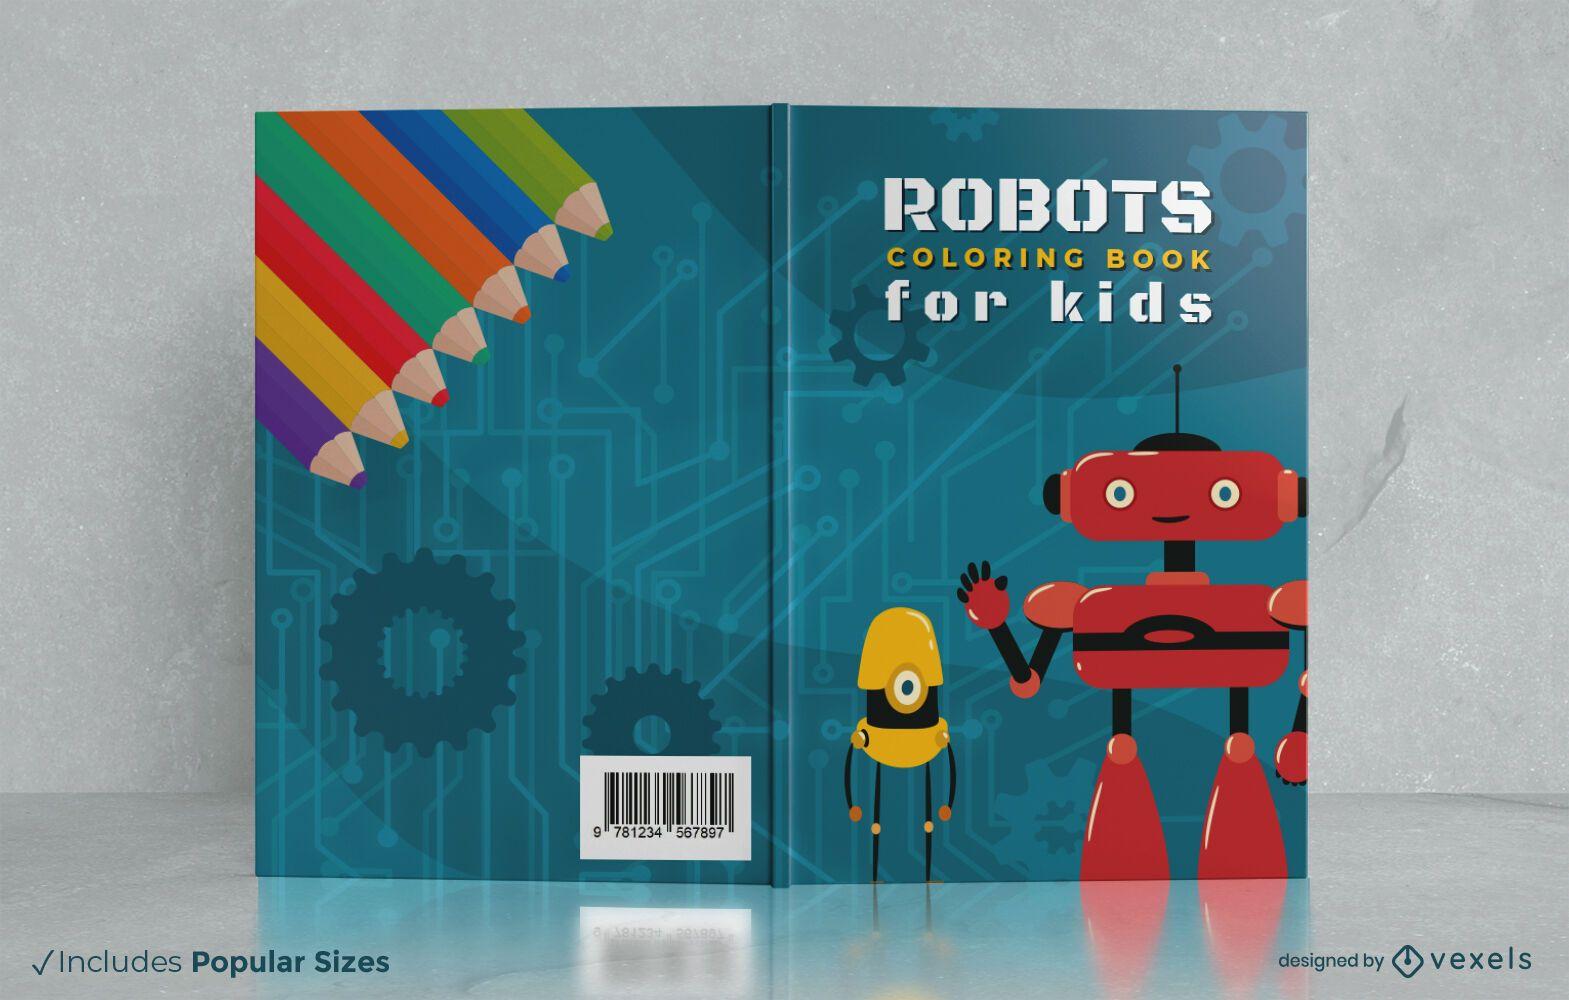 Robots coloring book cover design